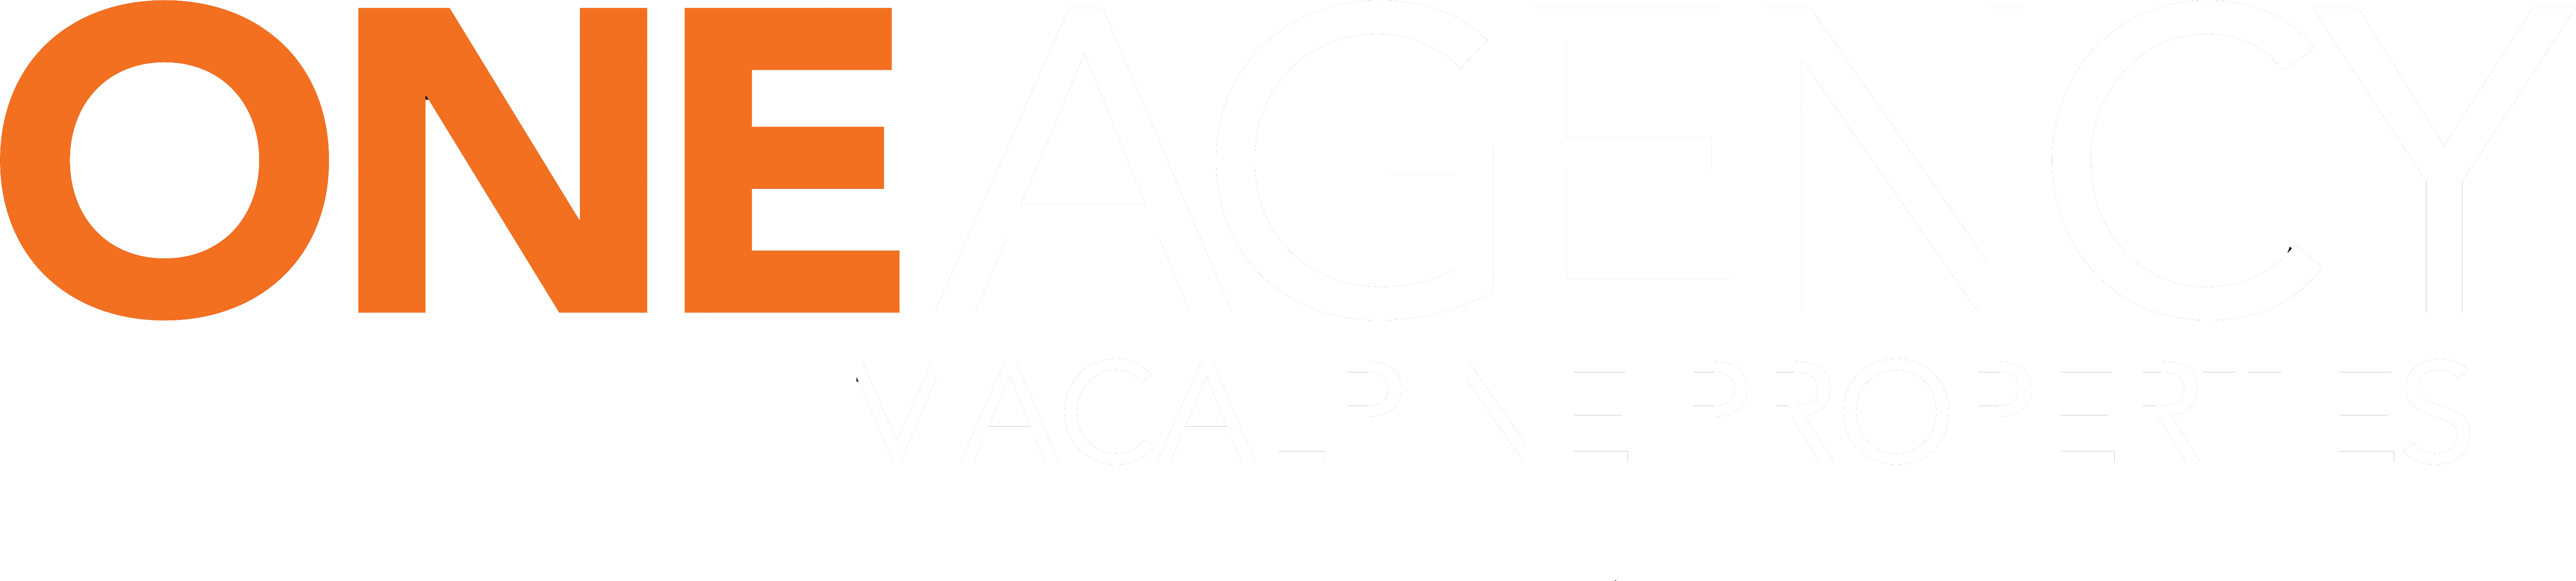 https://assets.boxdice.com.au/one-agency/attachments/2f3/b1c/logo_transparent.png?347fb91d2d128acdf1a6140675aaaf5a